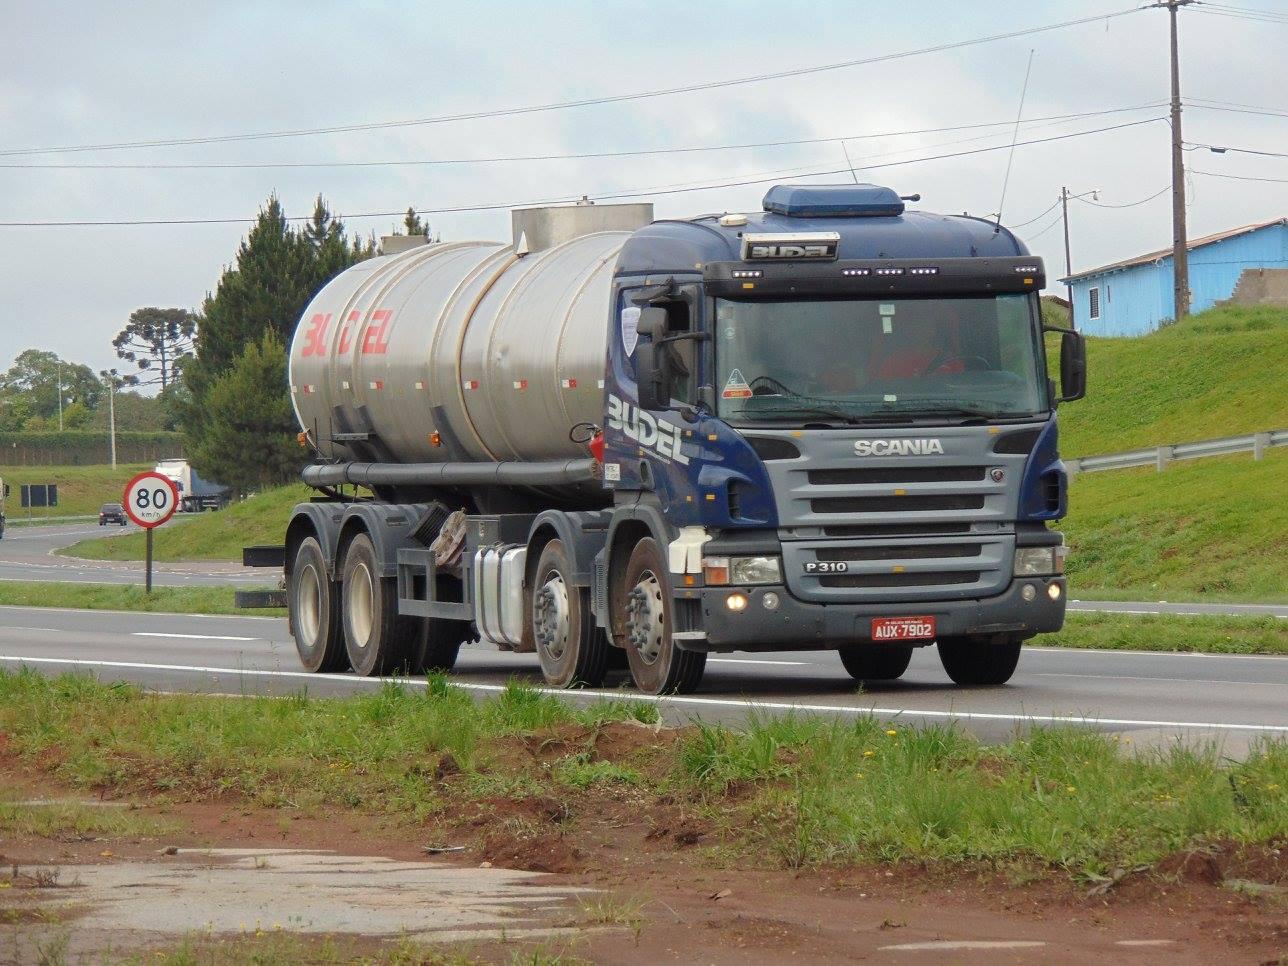 Scania-photo-5-1--2015-10